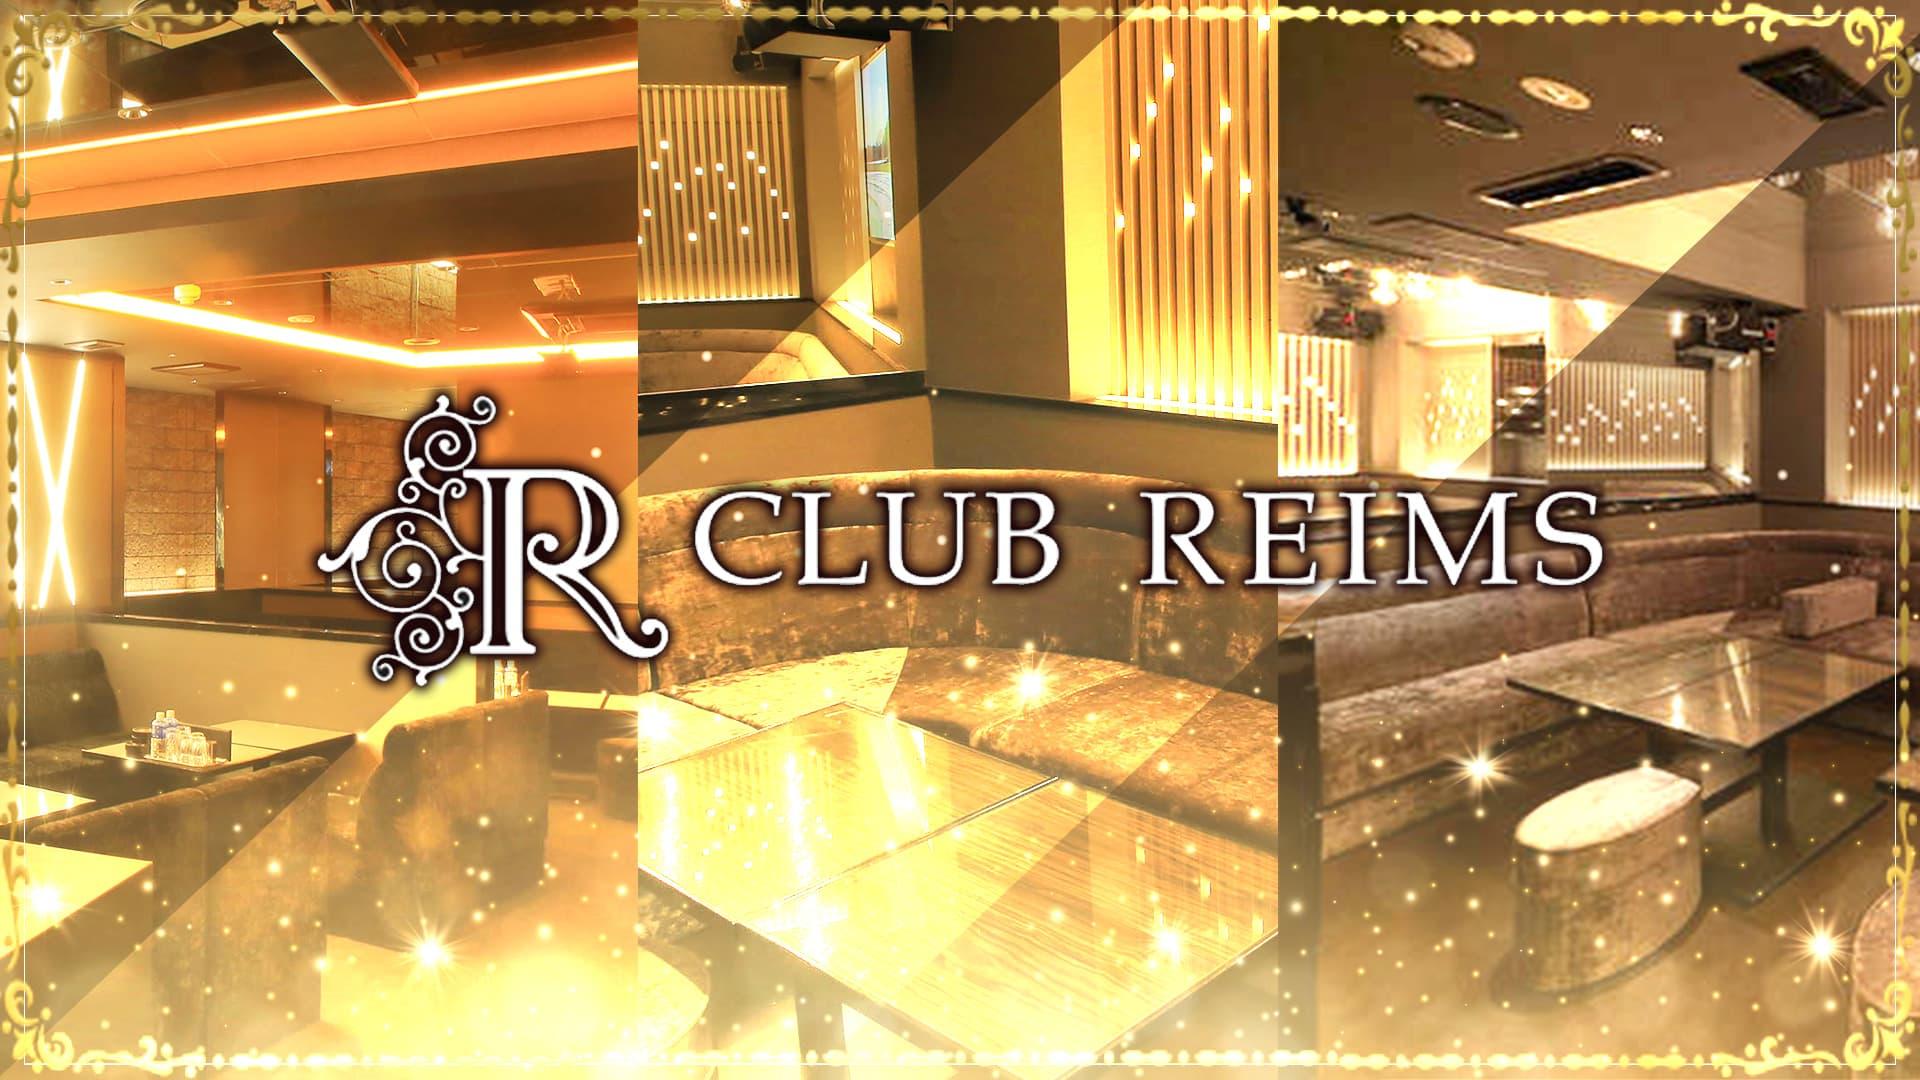 CLUB REIMS(クラブ ランス)【公式求人・体入情報】 北新地キャバクラ TOP画像